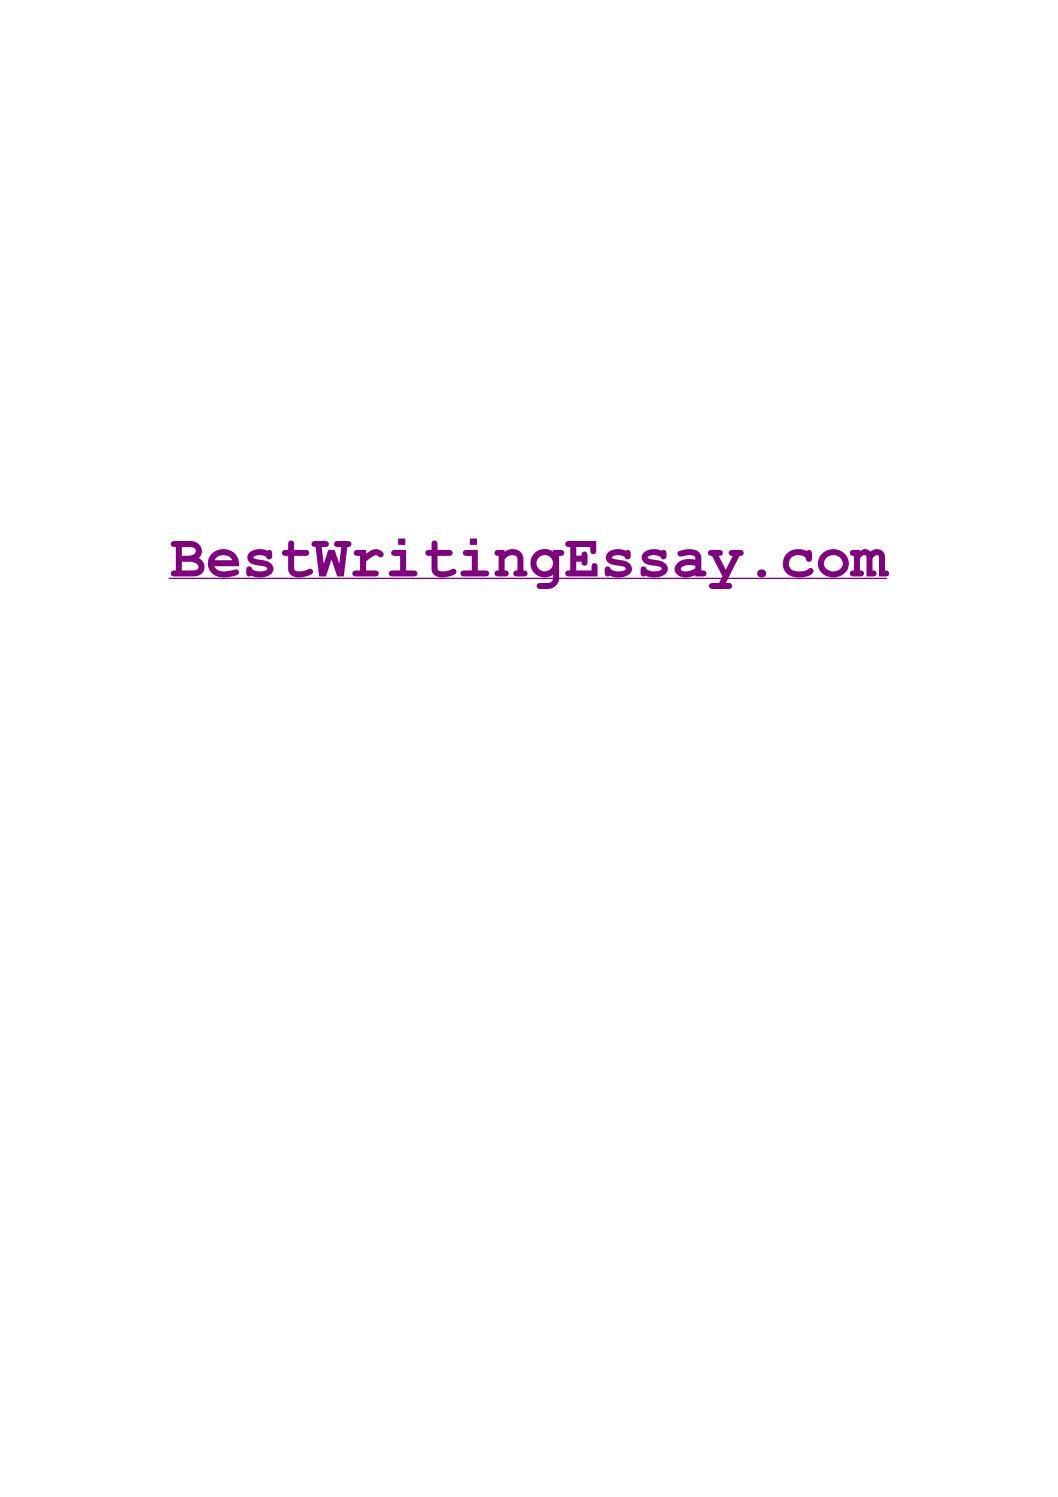 College application essay help online michael mason